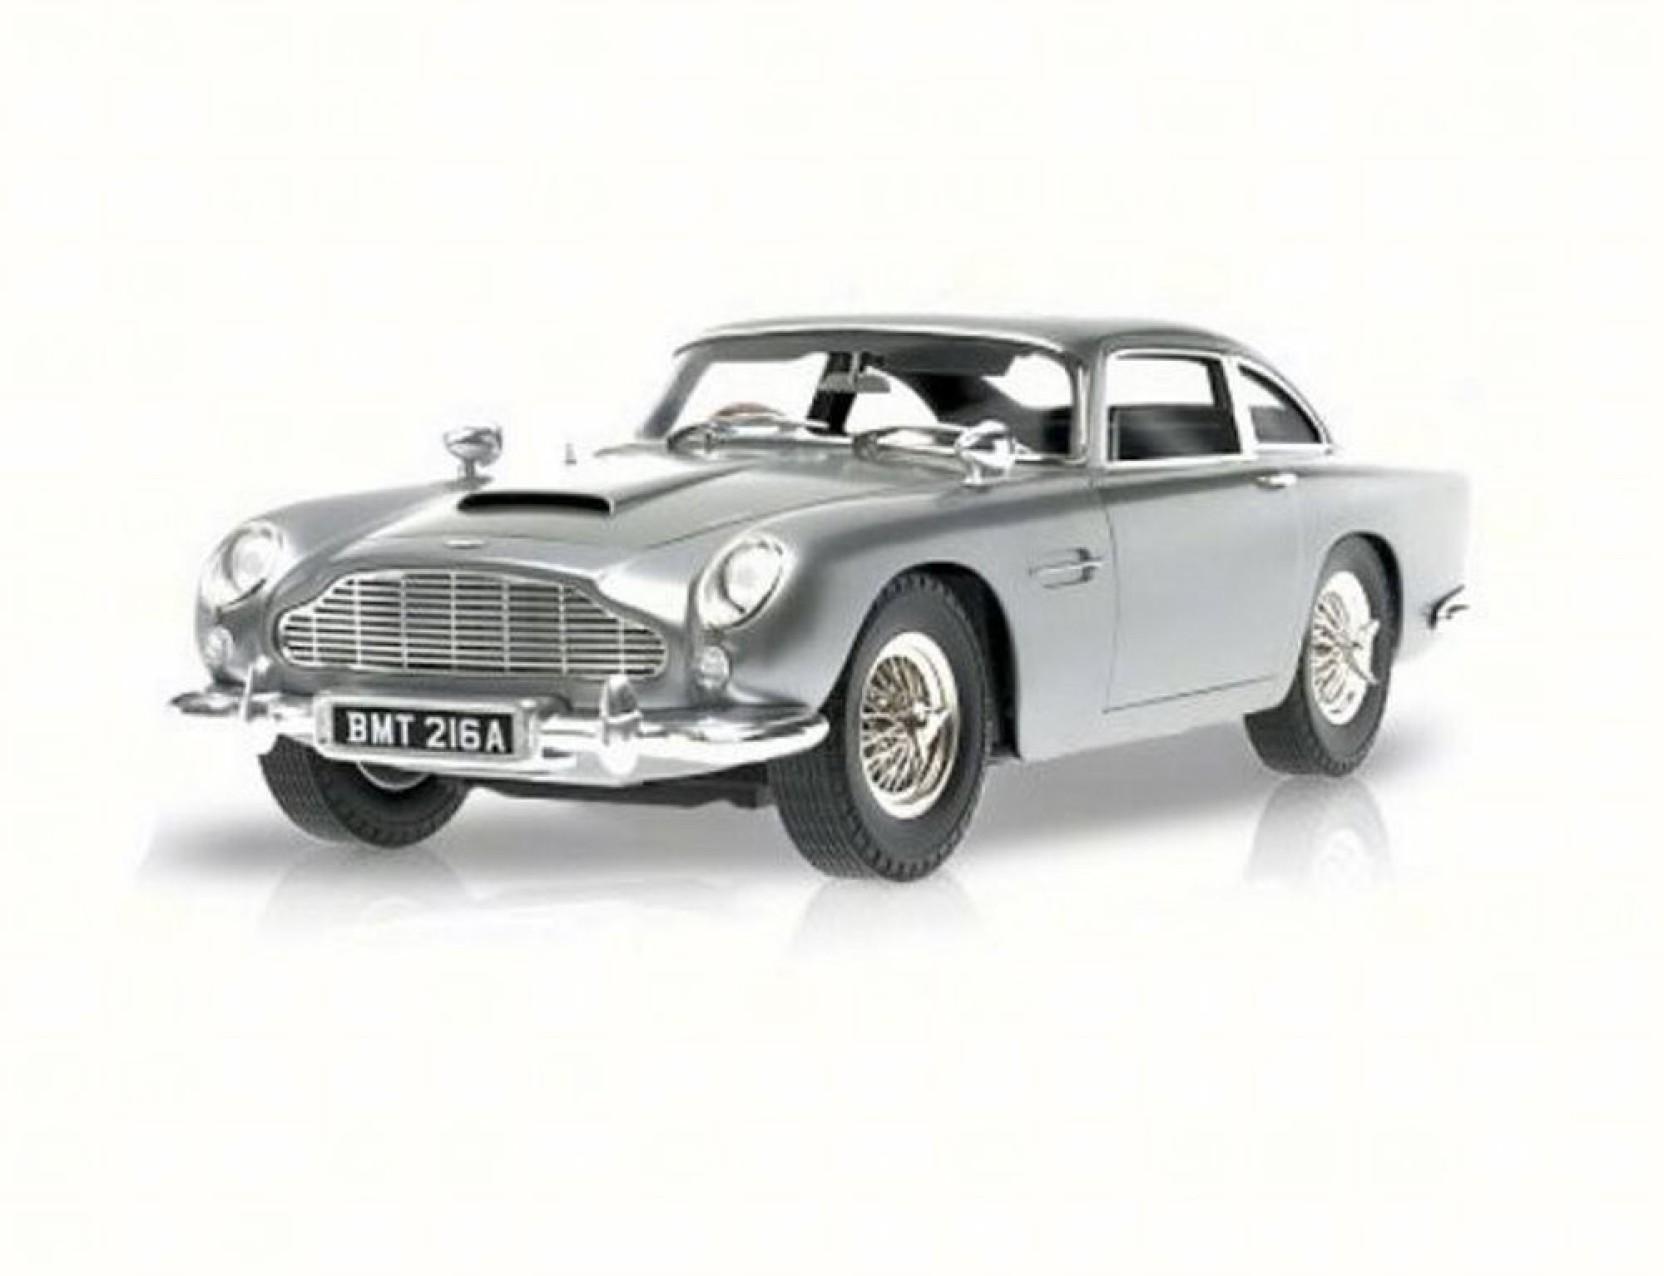 mattel/hot wheels james bond's goldfinger aston martin db5, silver